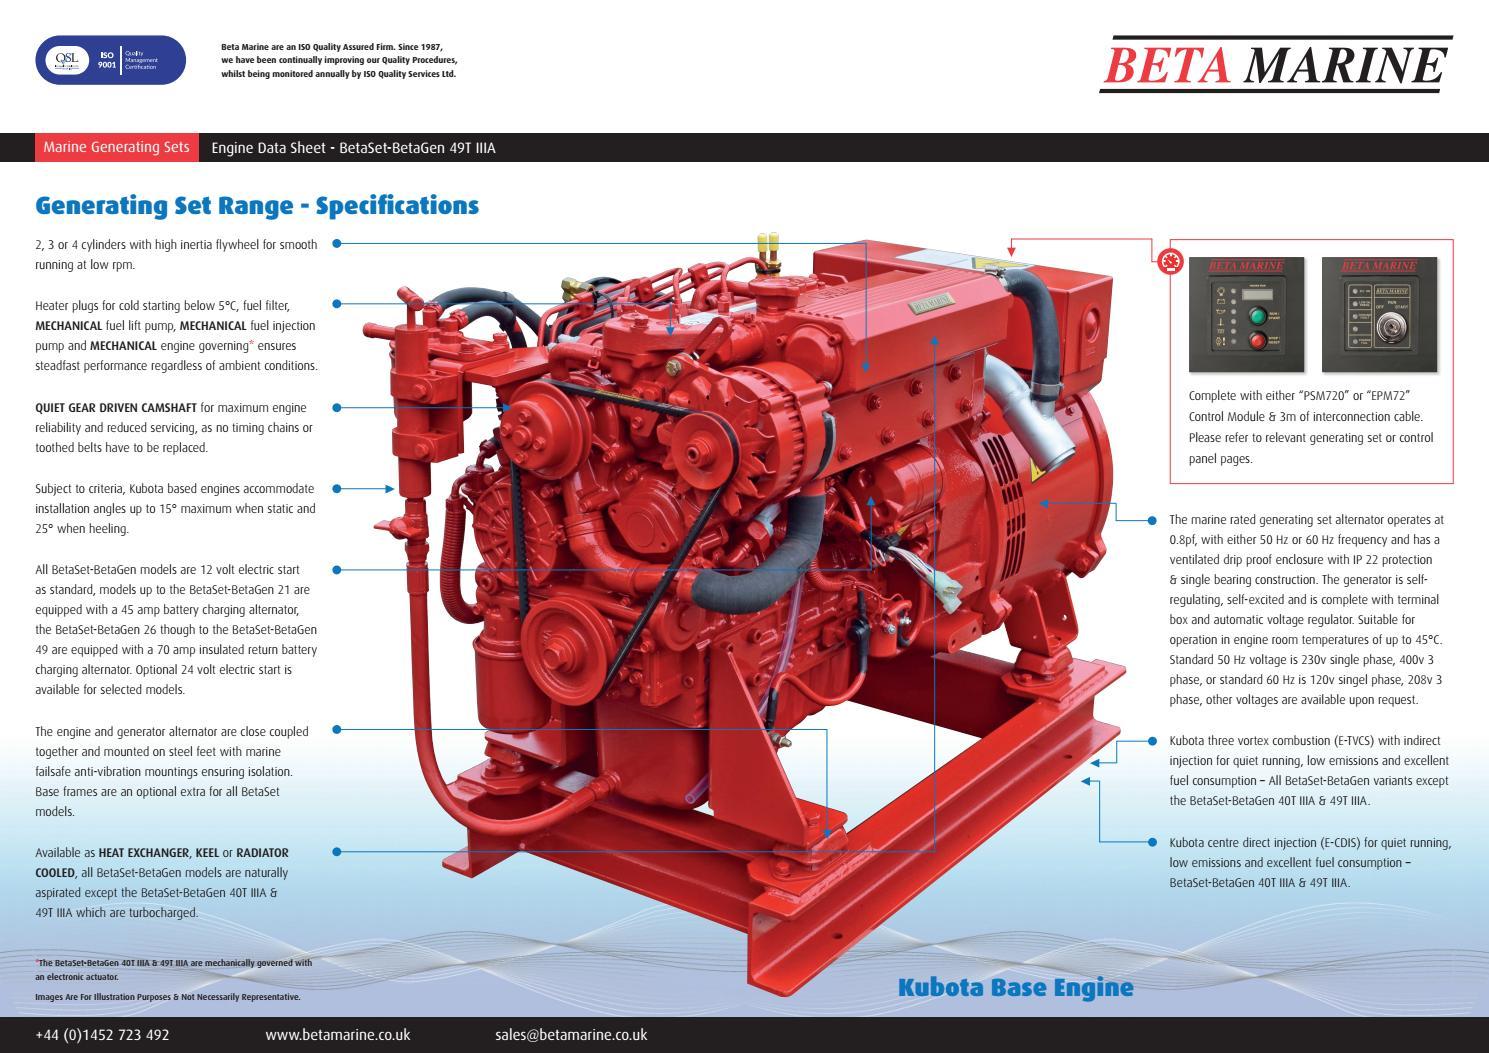 BetaSet-BetaGen 49T IIIA DataSheet REV-03 - 0619 by Beta Marine - issuu